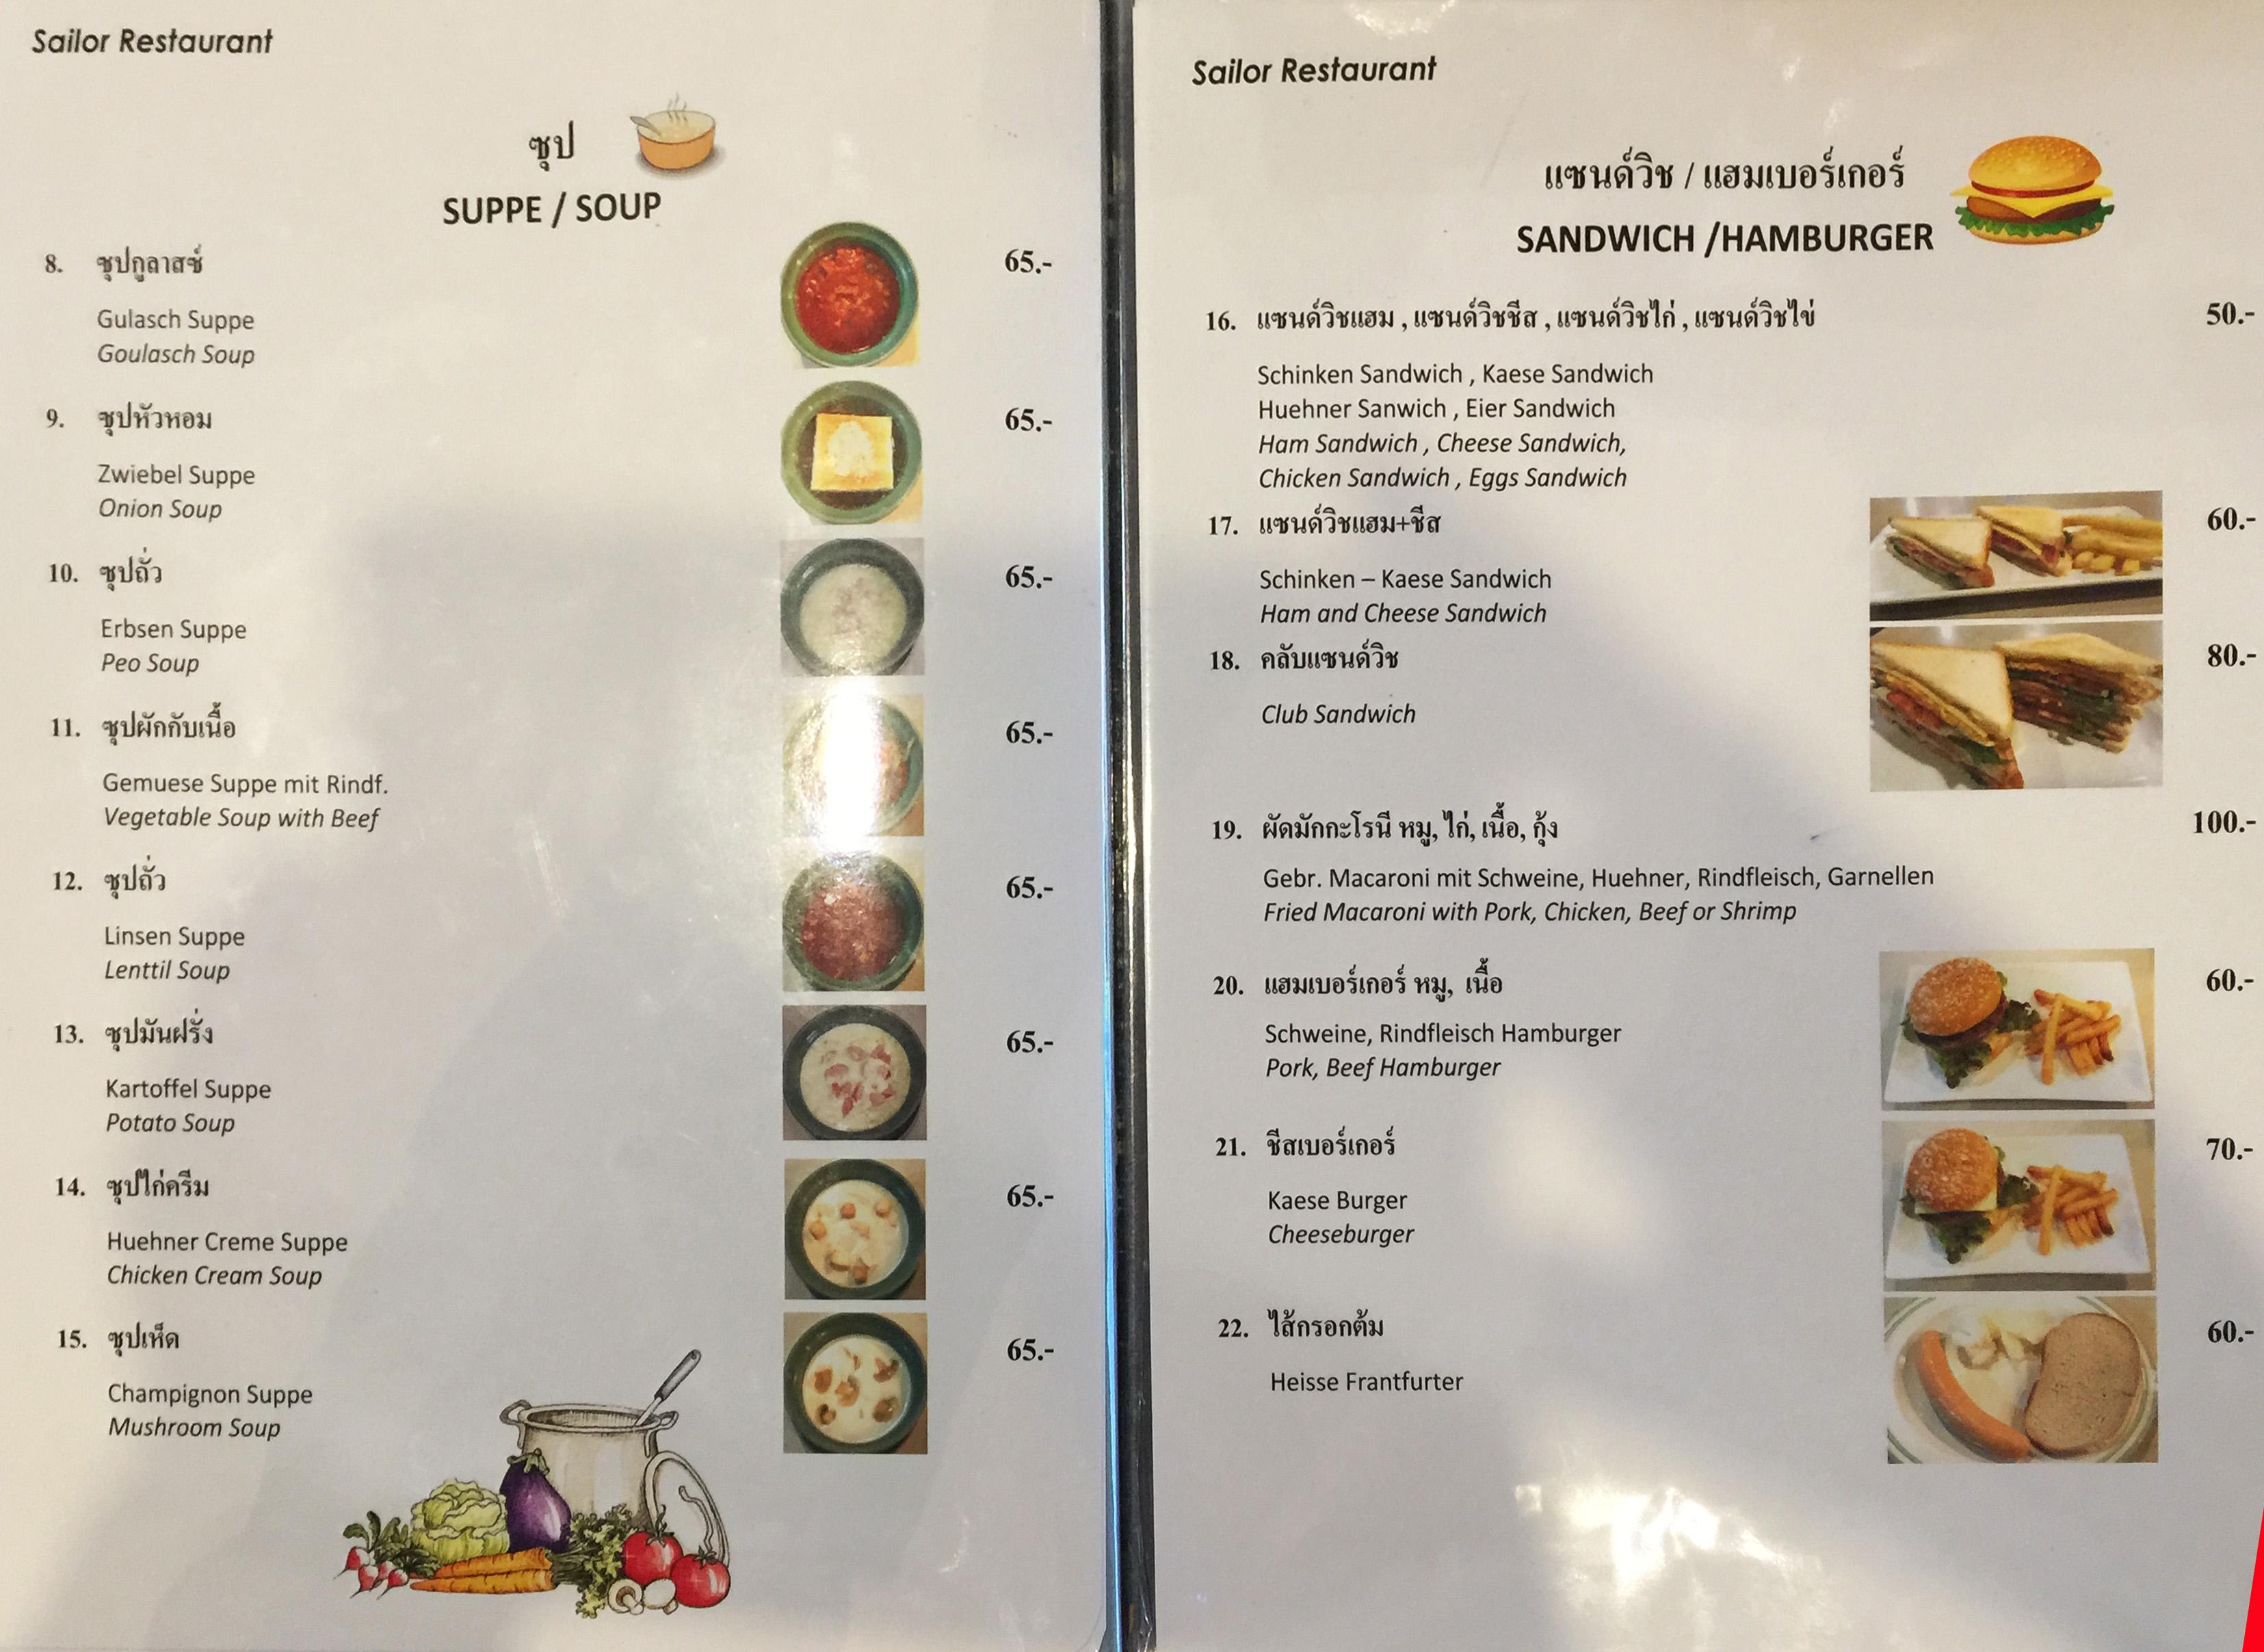 Speisekarte / Menü Preise in der Sailor Bar